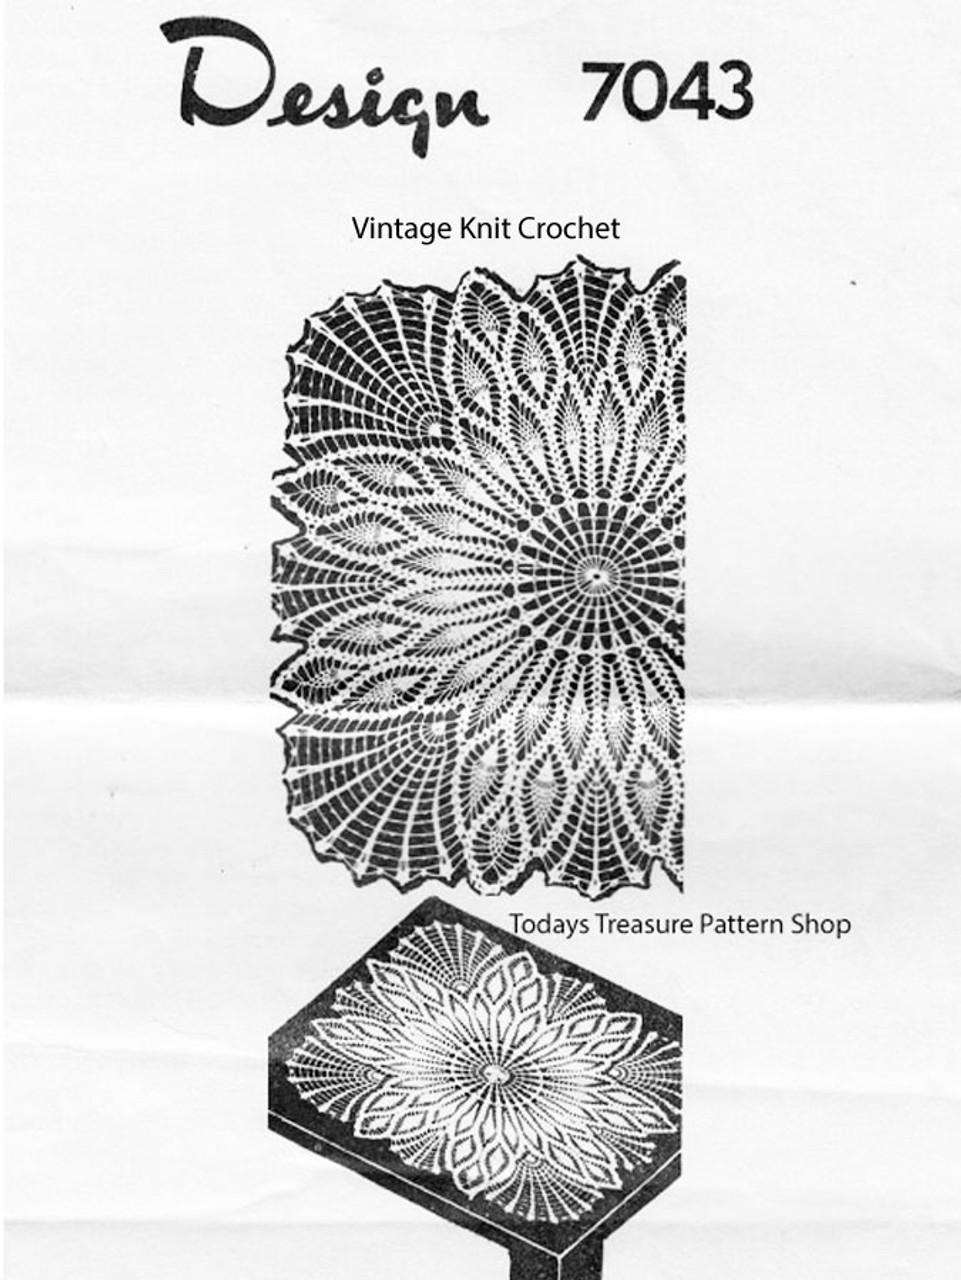 Crochet Pineapple Centerpiece Doily Pattern, Design 7043